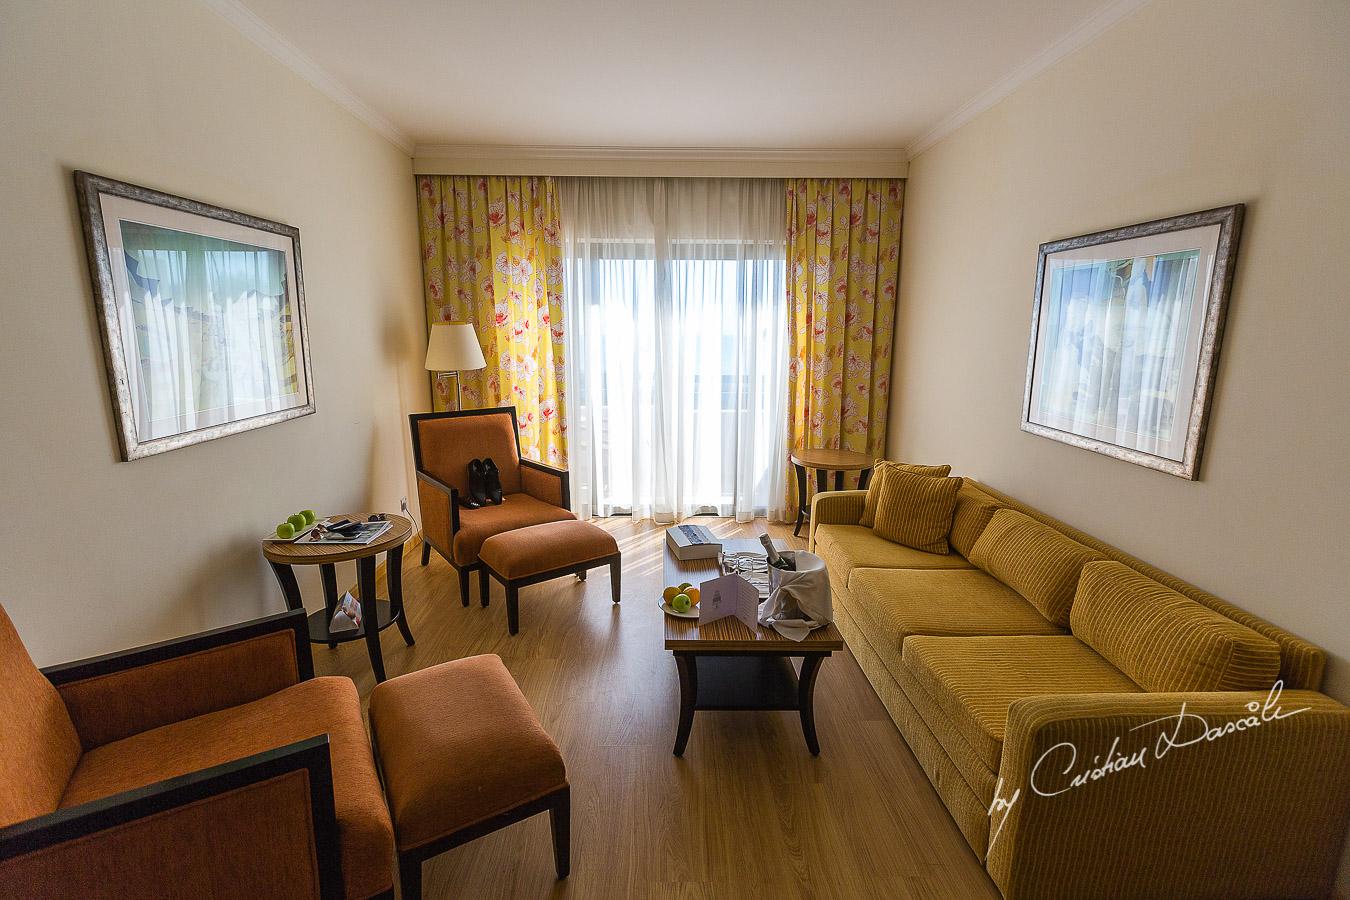 Groom's room at Elias Beach Hotel in Limassol